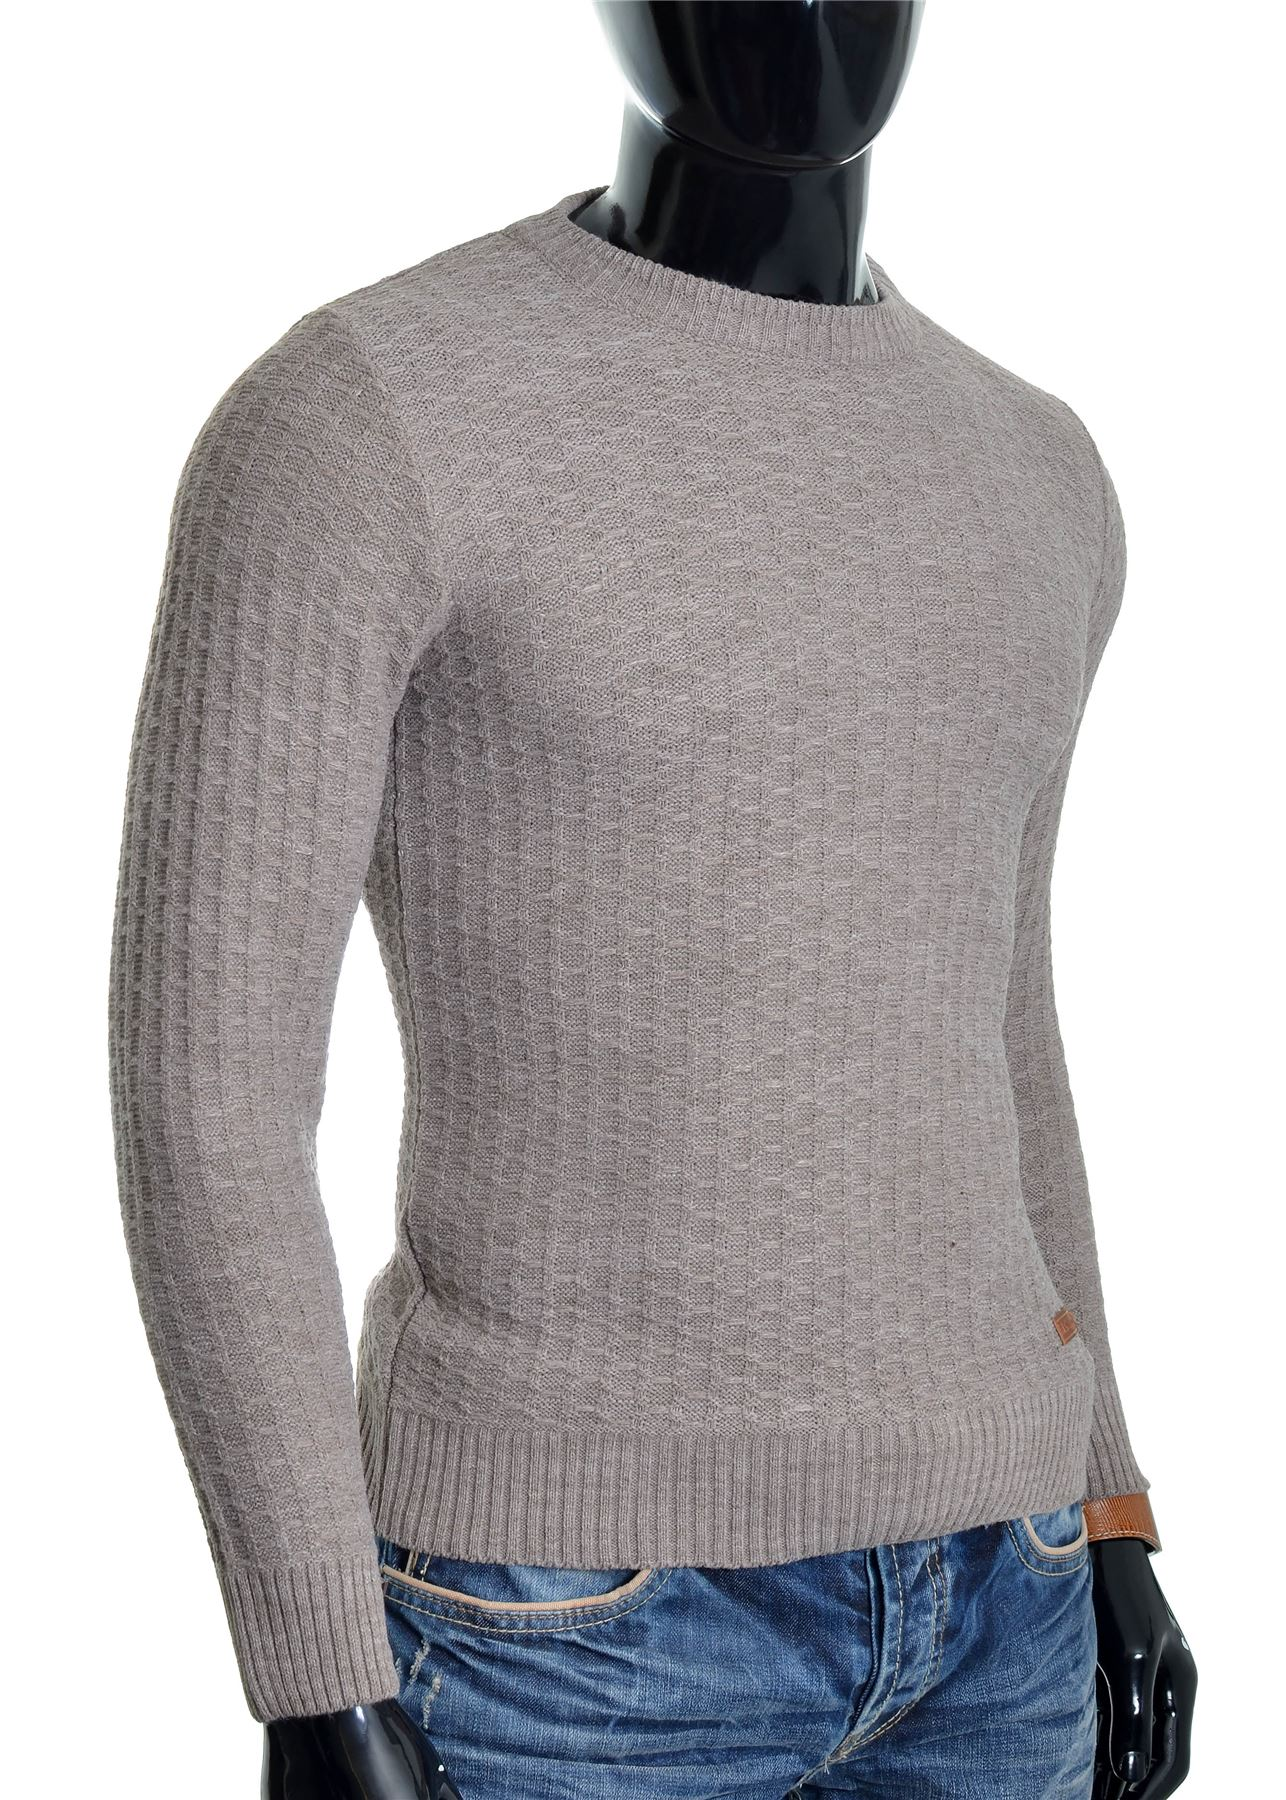 D-amp-R-Men-039-s-Wool-Knit-Jumper-Smart-Long-Sleeve-Sweater-Crew-Neck-Top thumbnail 5